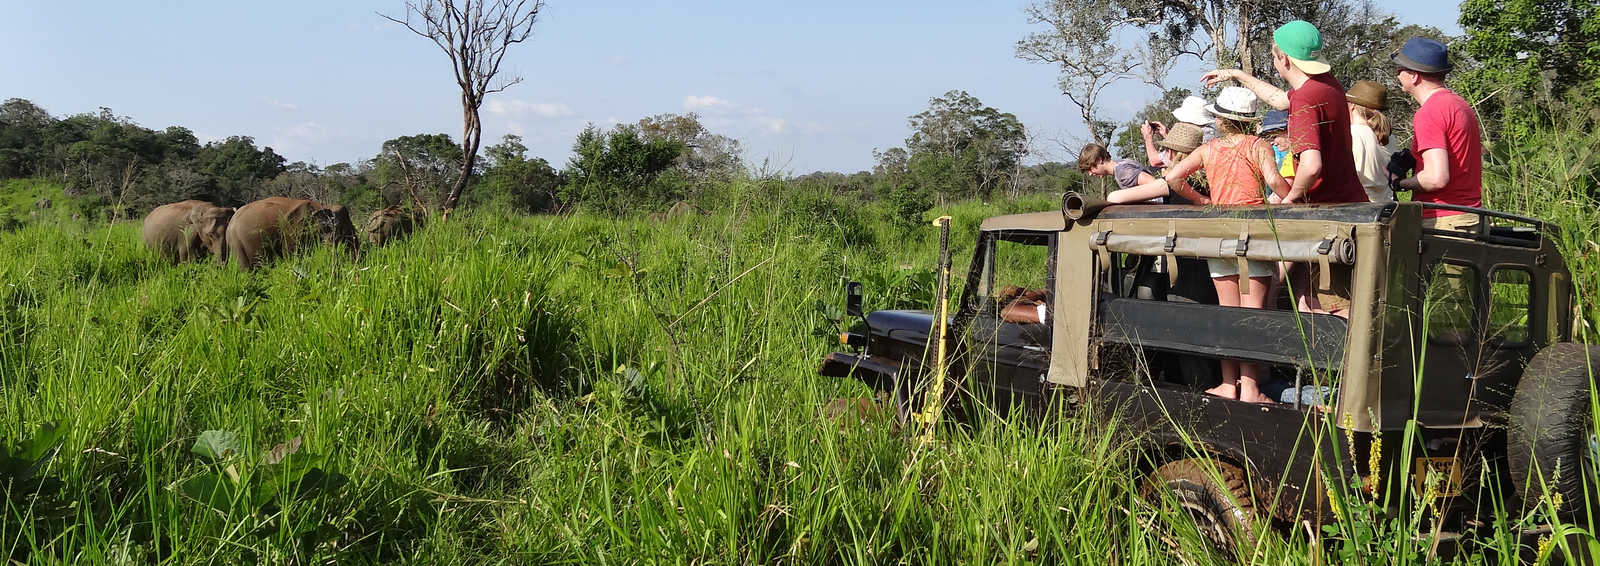 Elepant Sarari near Giritale